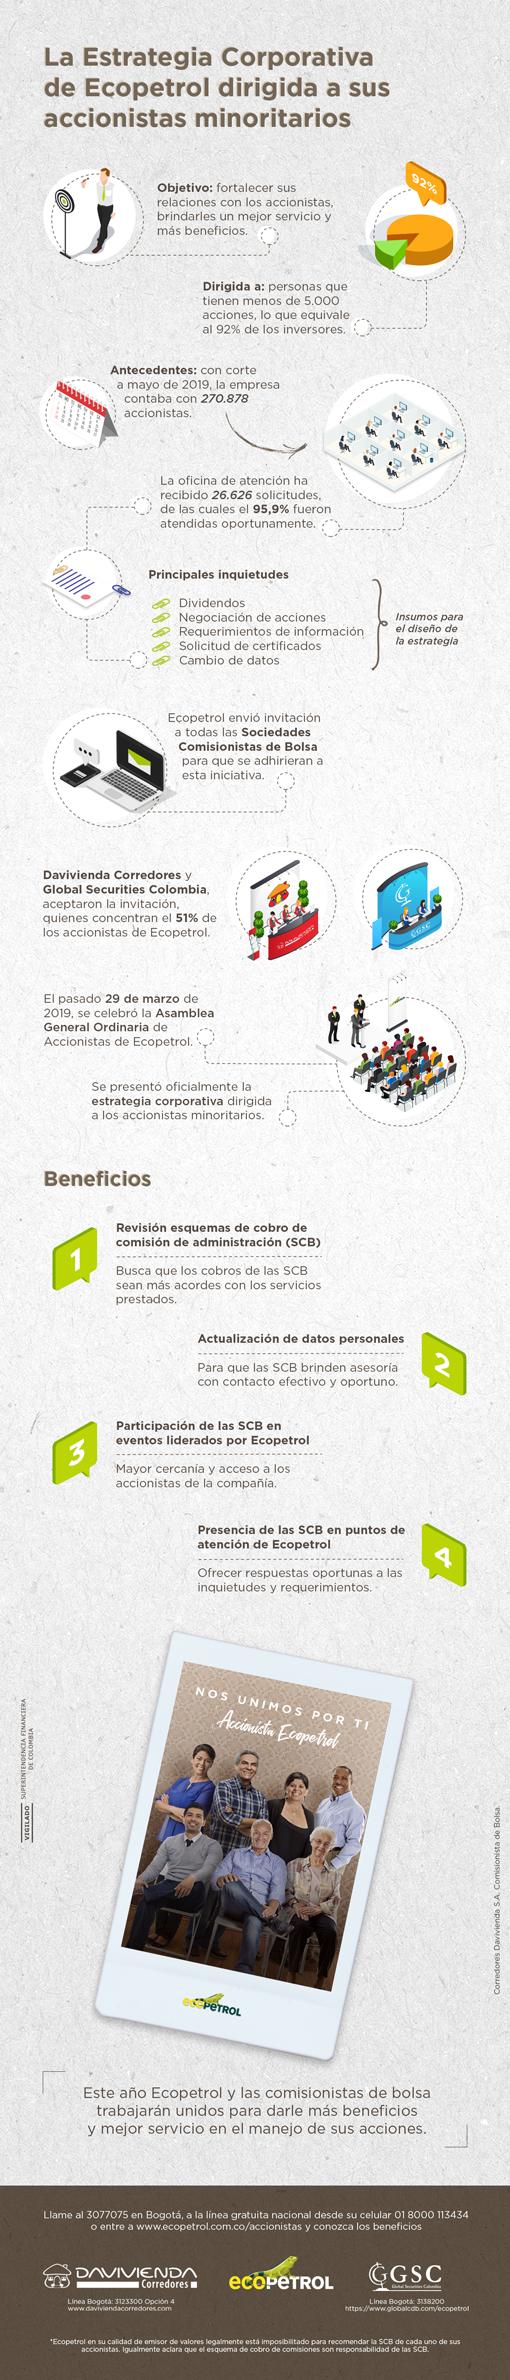 Infografia-Ecopetrol